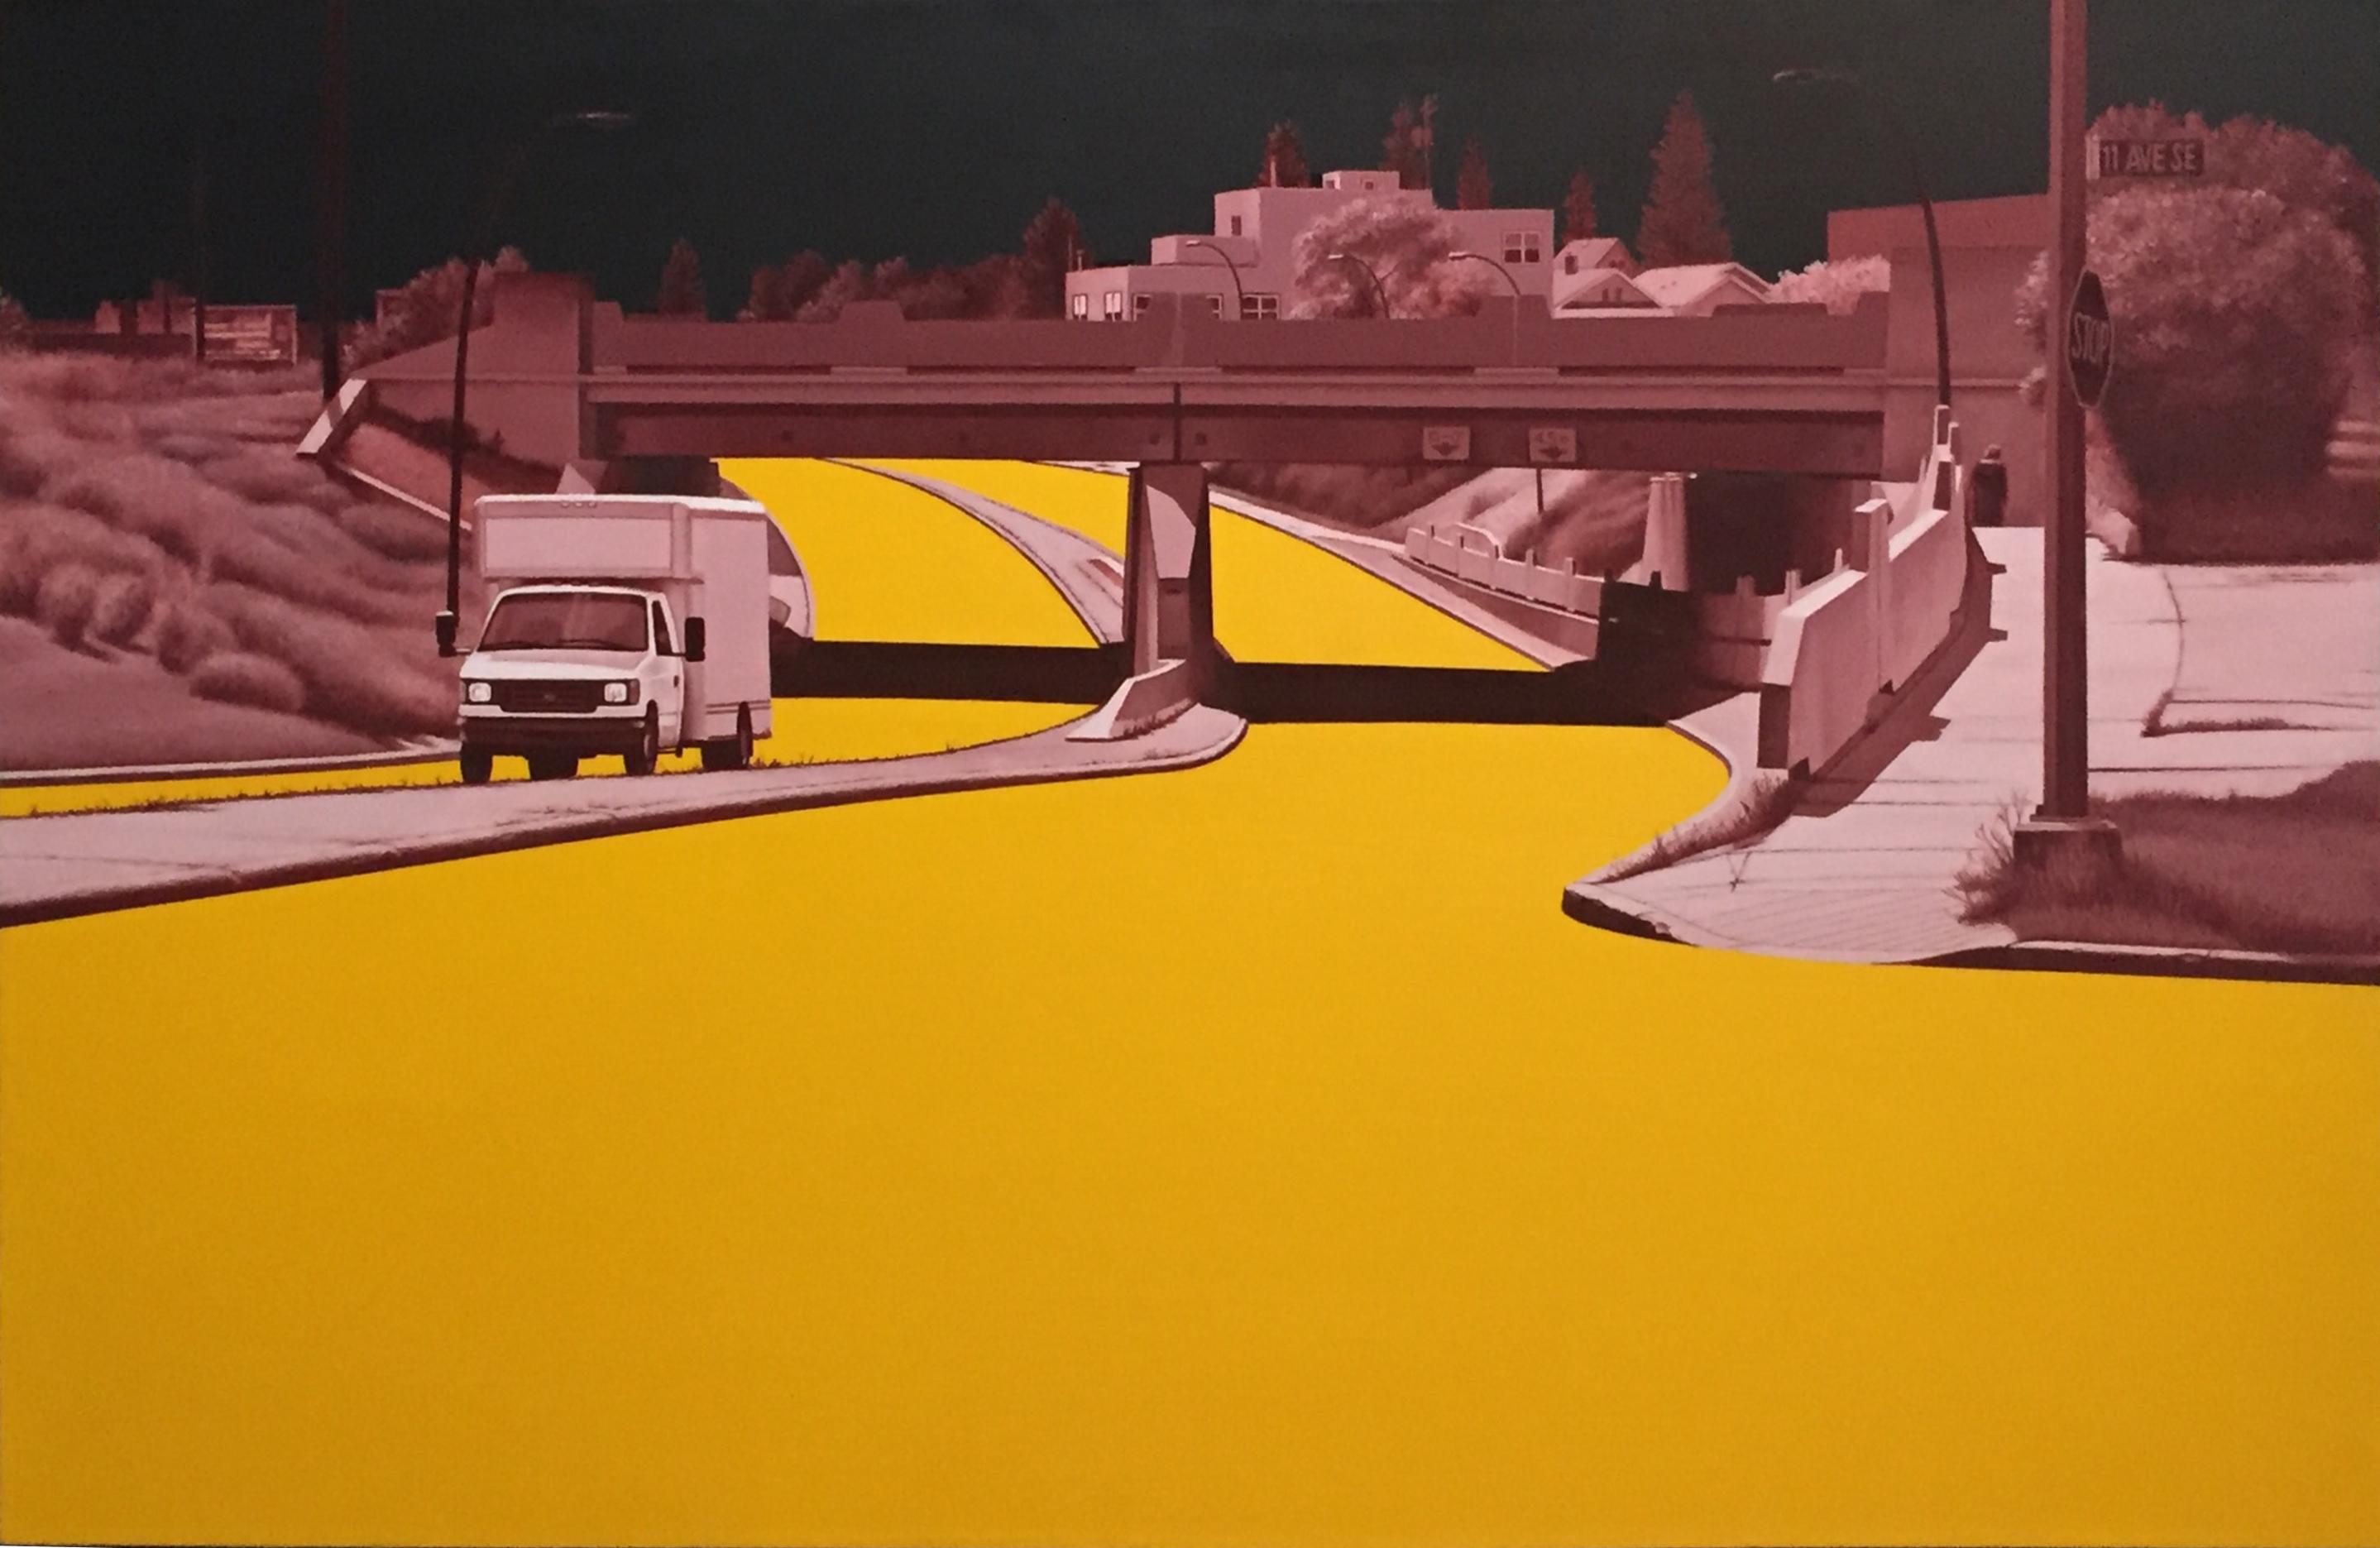 Underpass 2017 (30 x 48) (1)